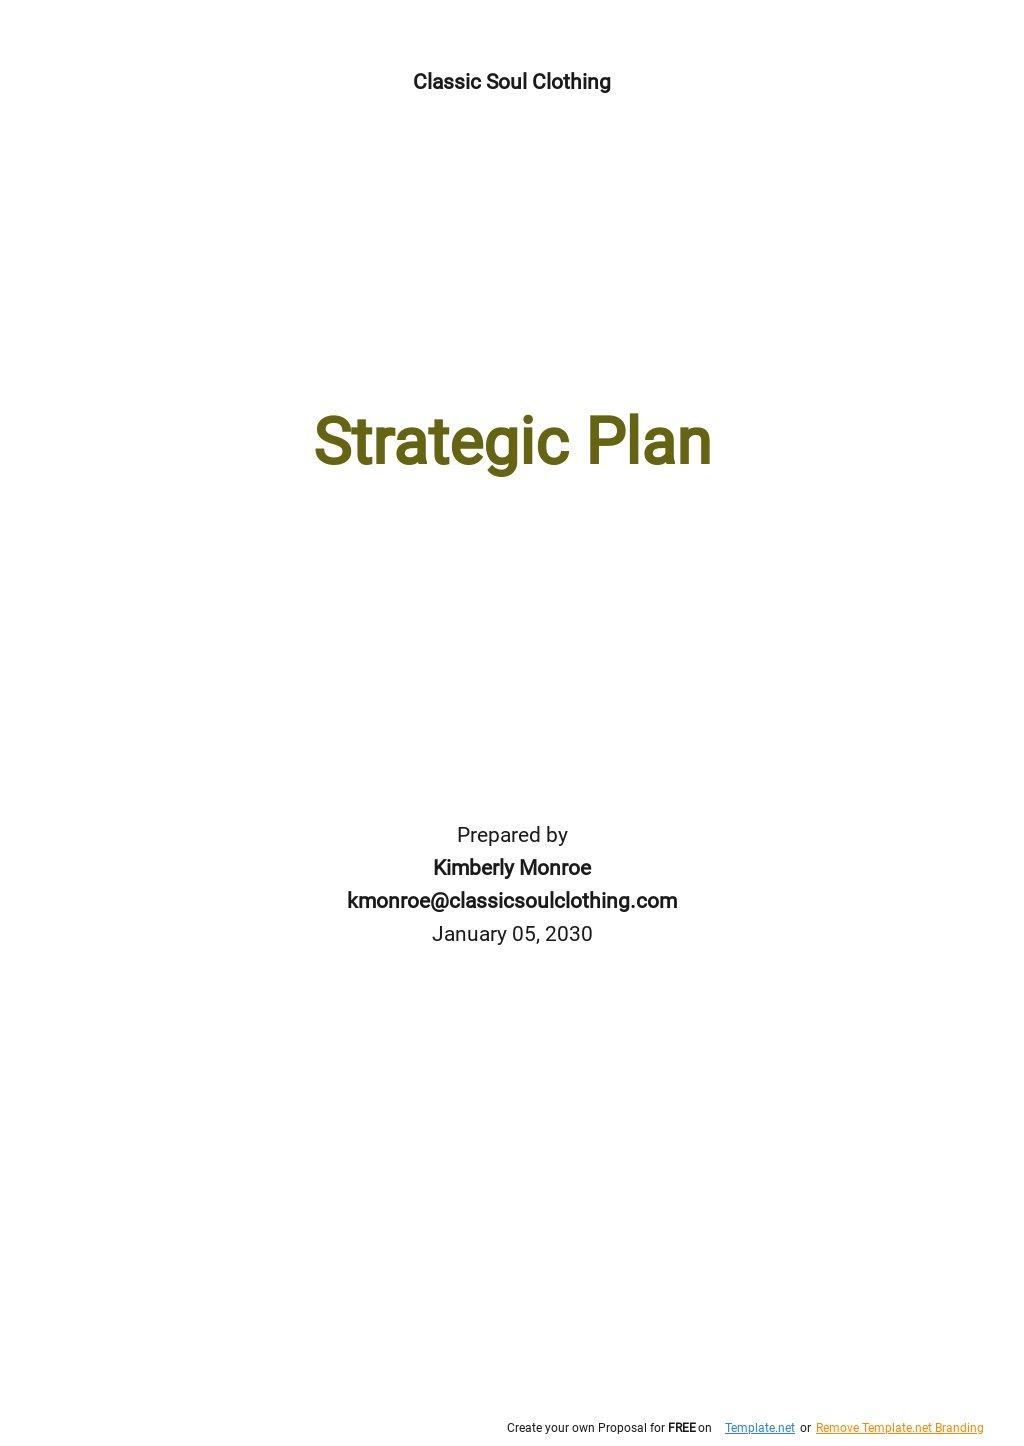 Strategic Plan Template.jpe